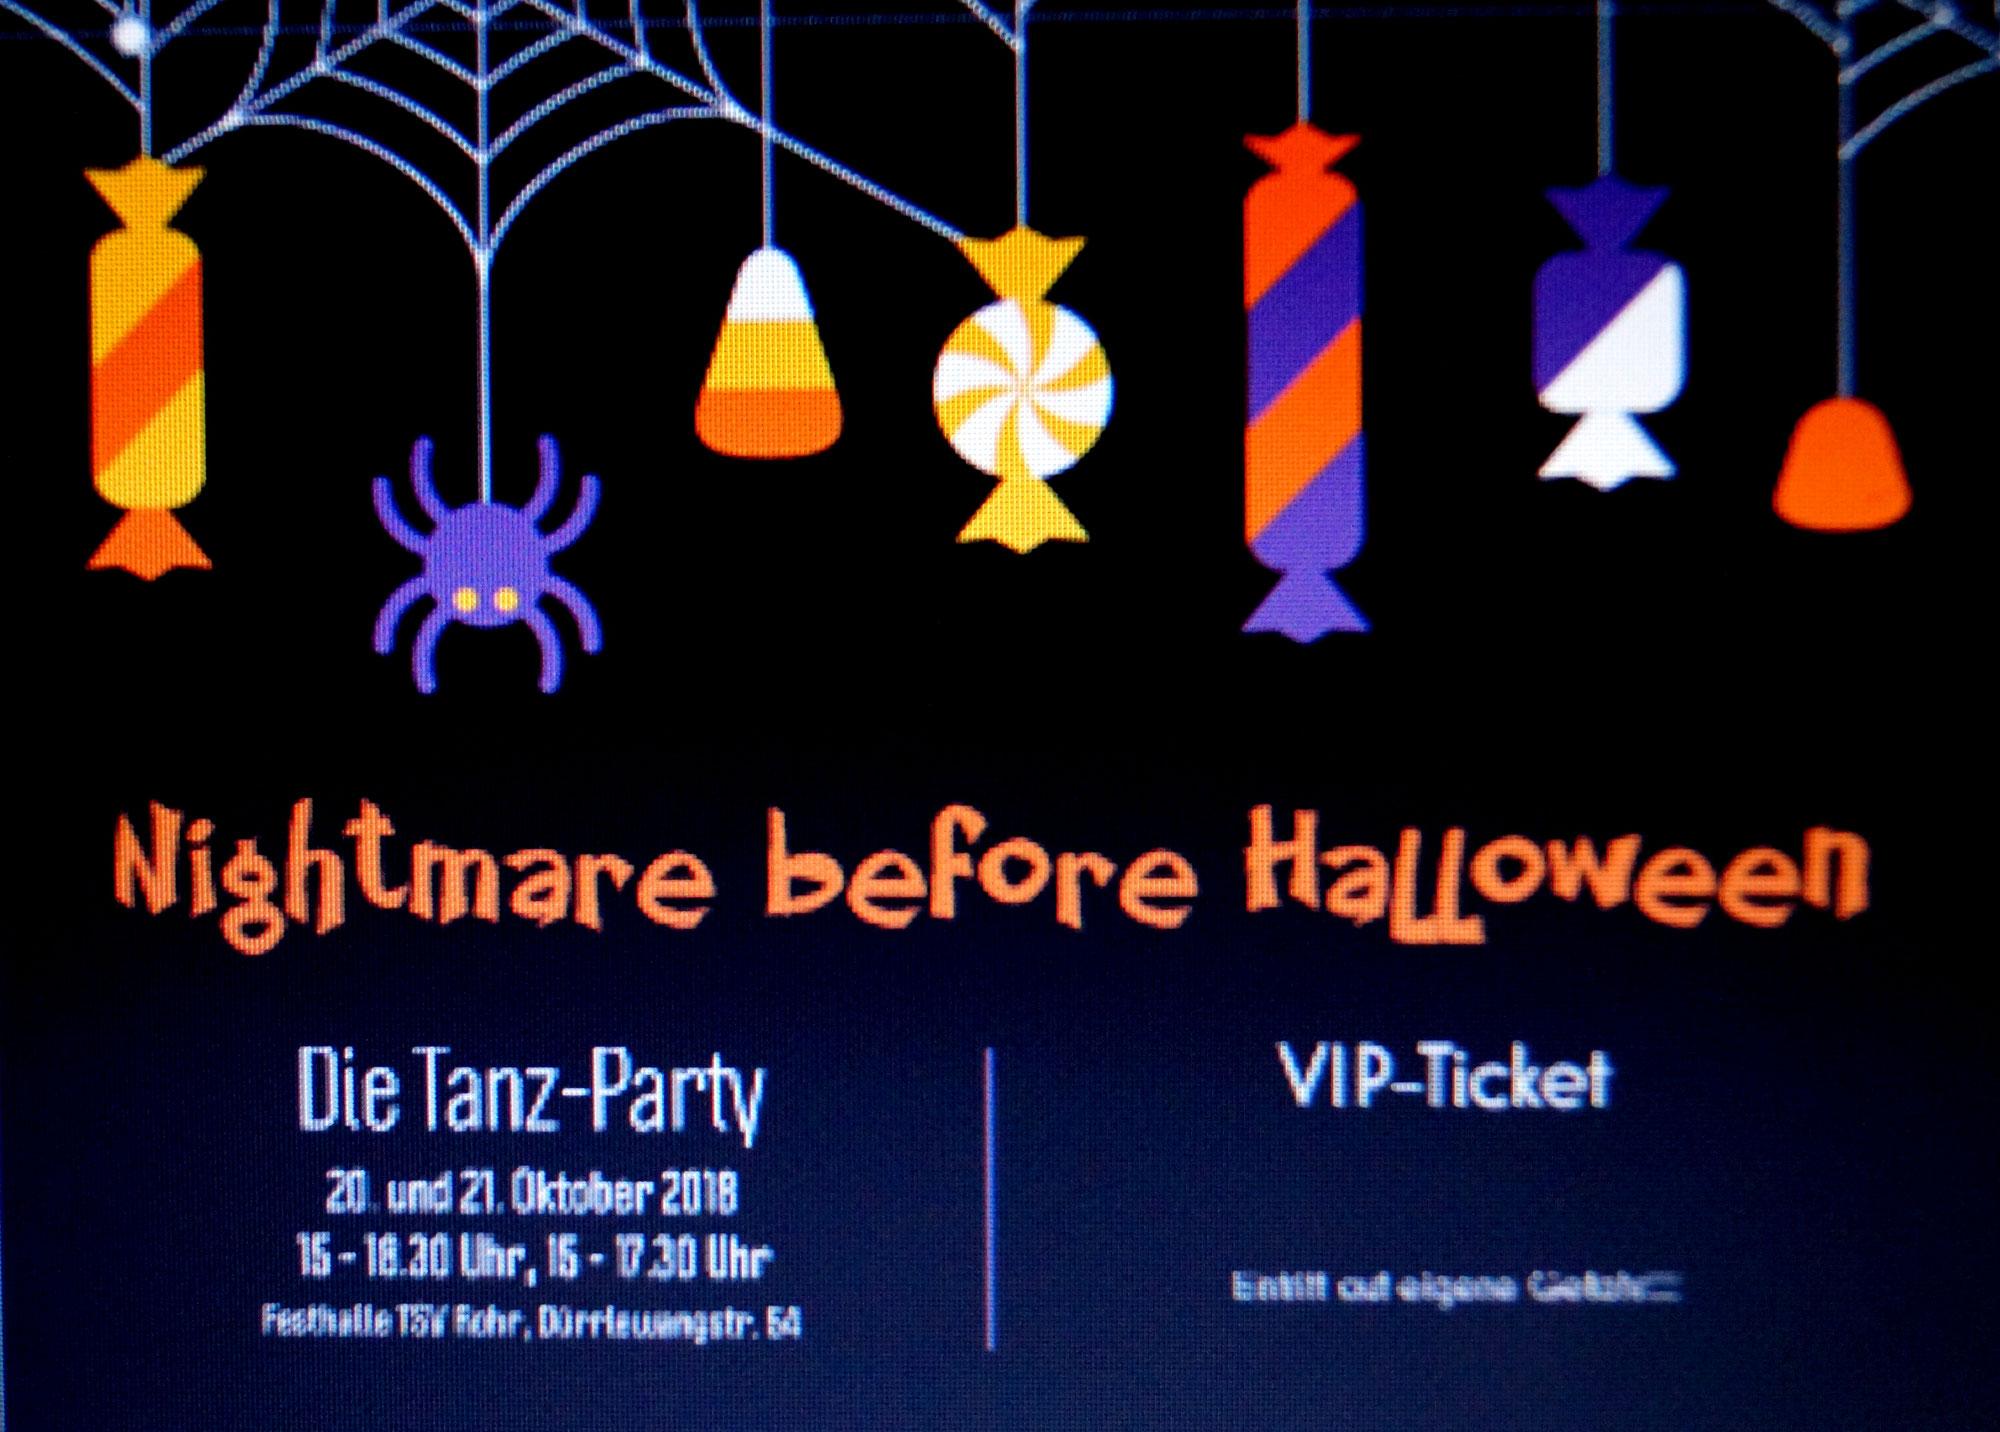 Halloweenparty 2018 - Nightmare before Halloween